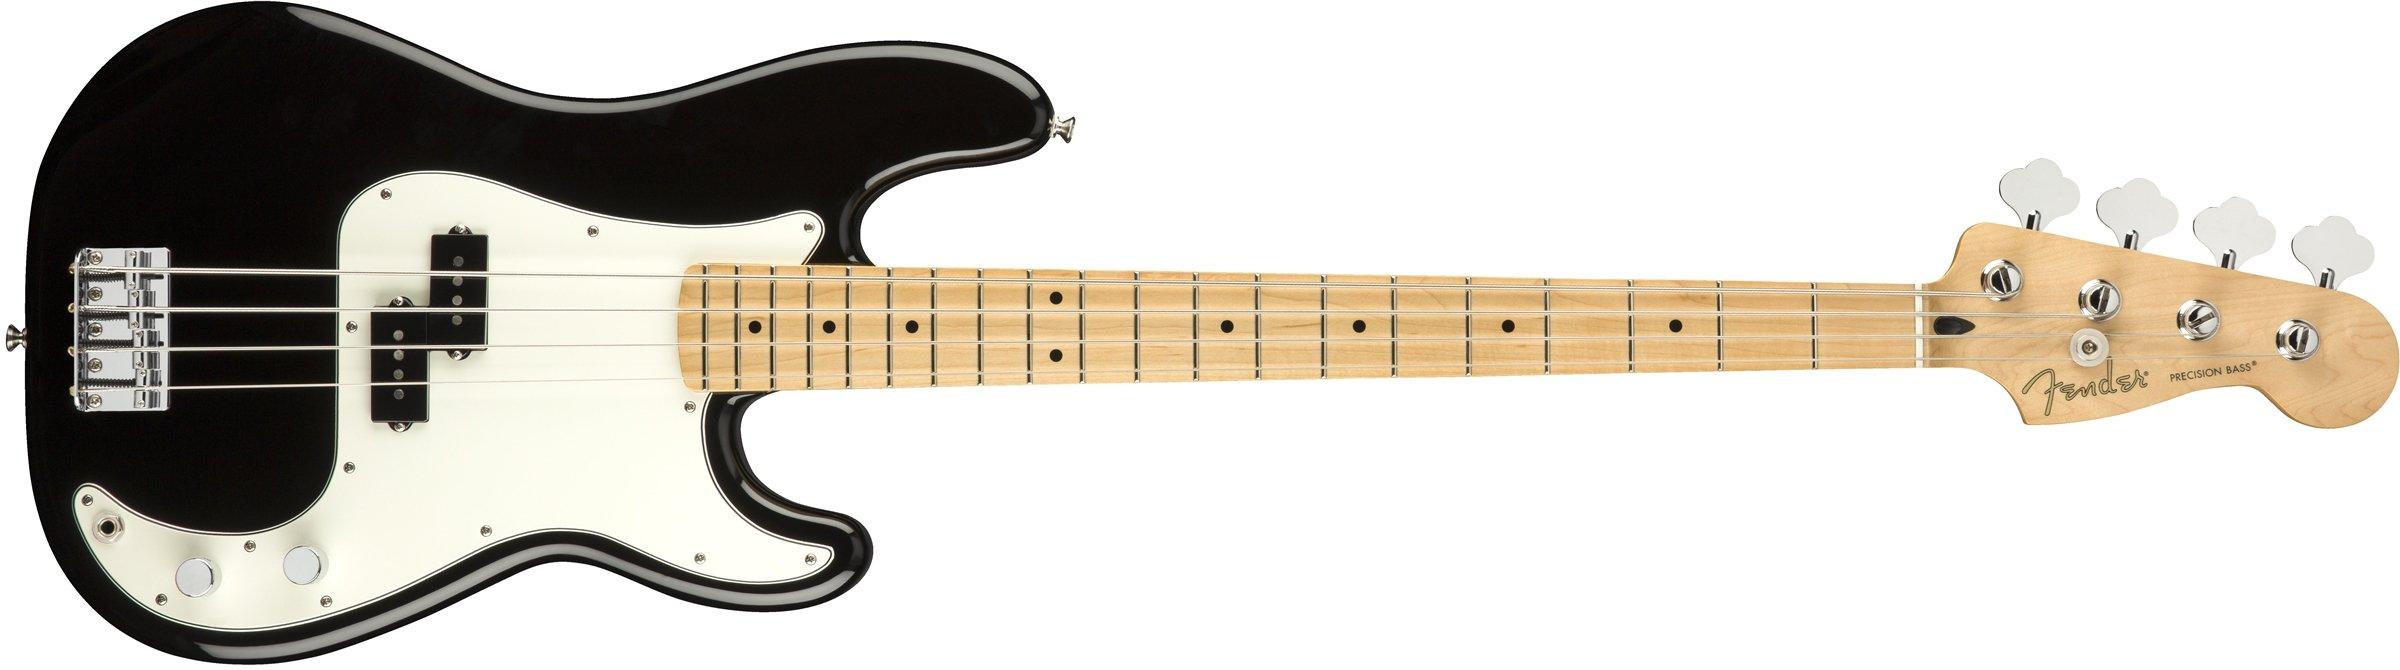 Fender Player Precision Electric Bass Guitar - Maple Fingerboard - Black